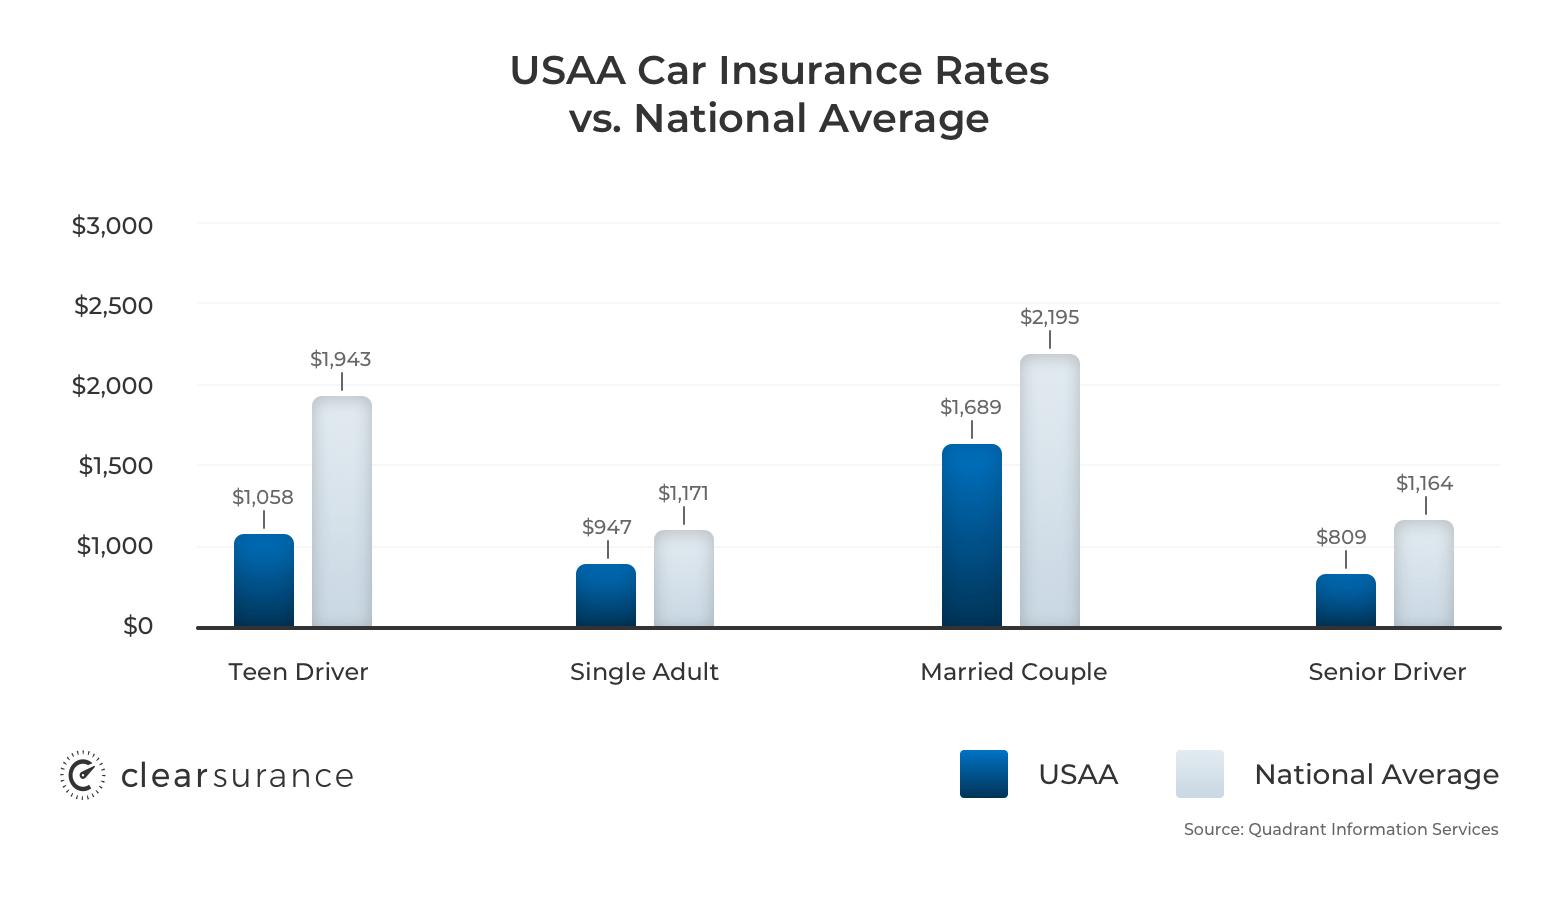 USAA car insurance rates